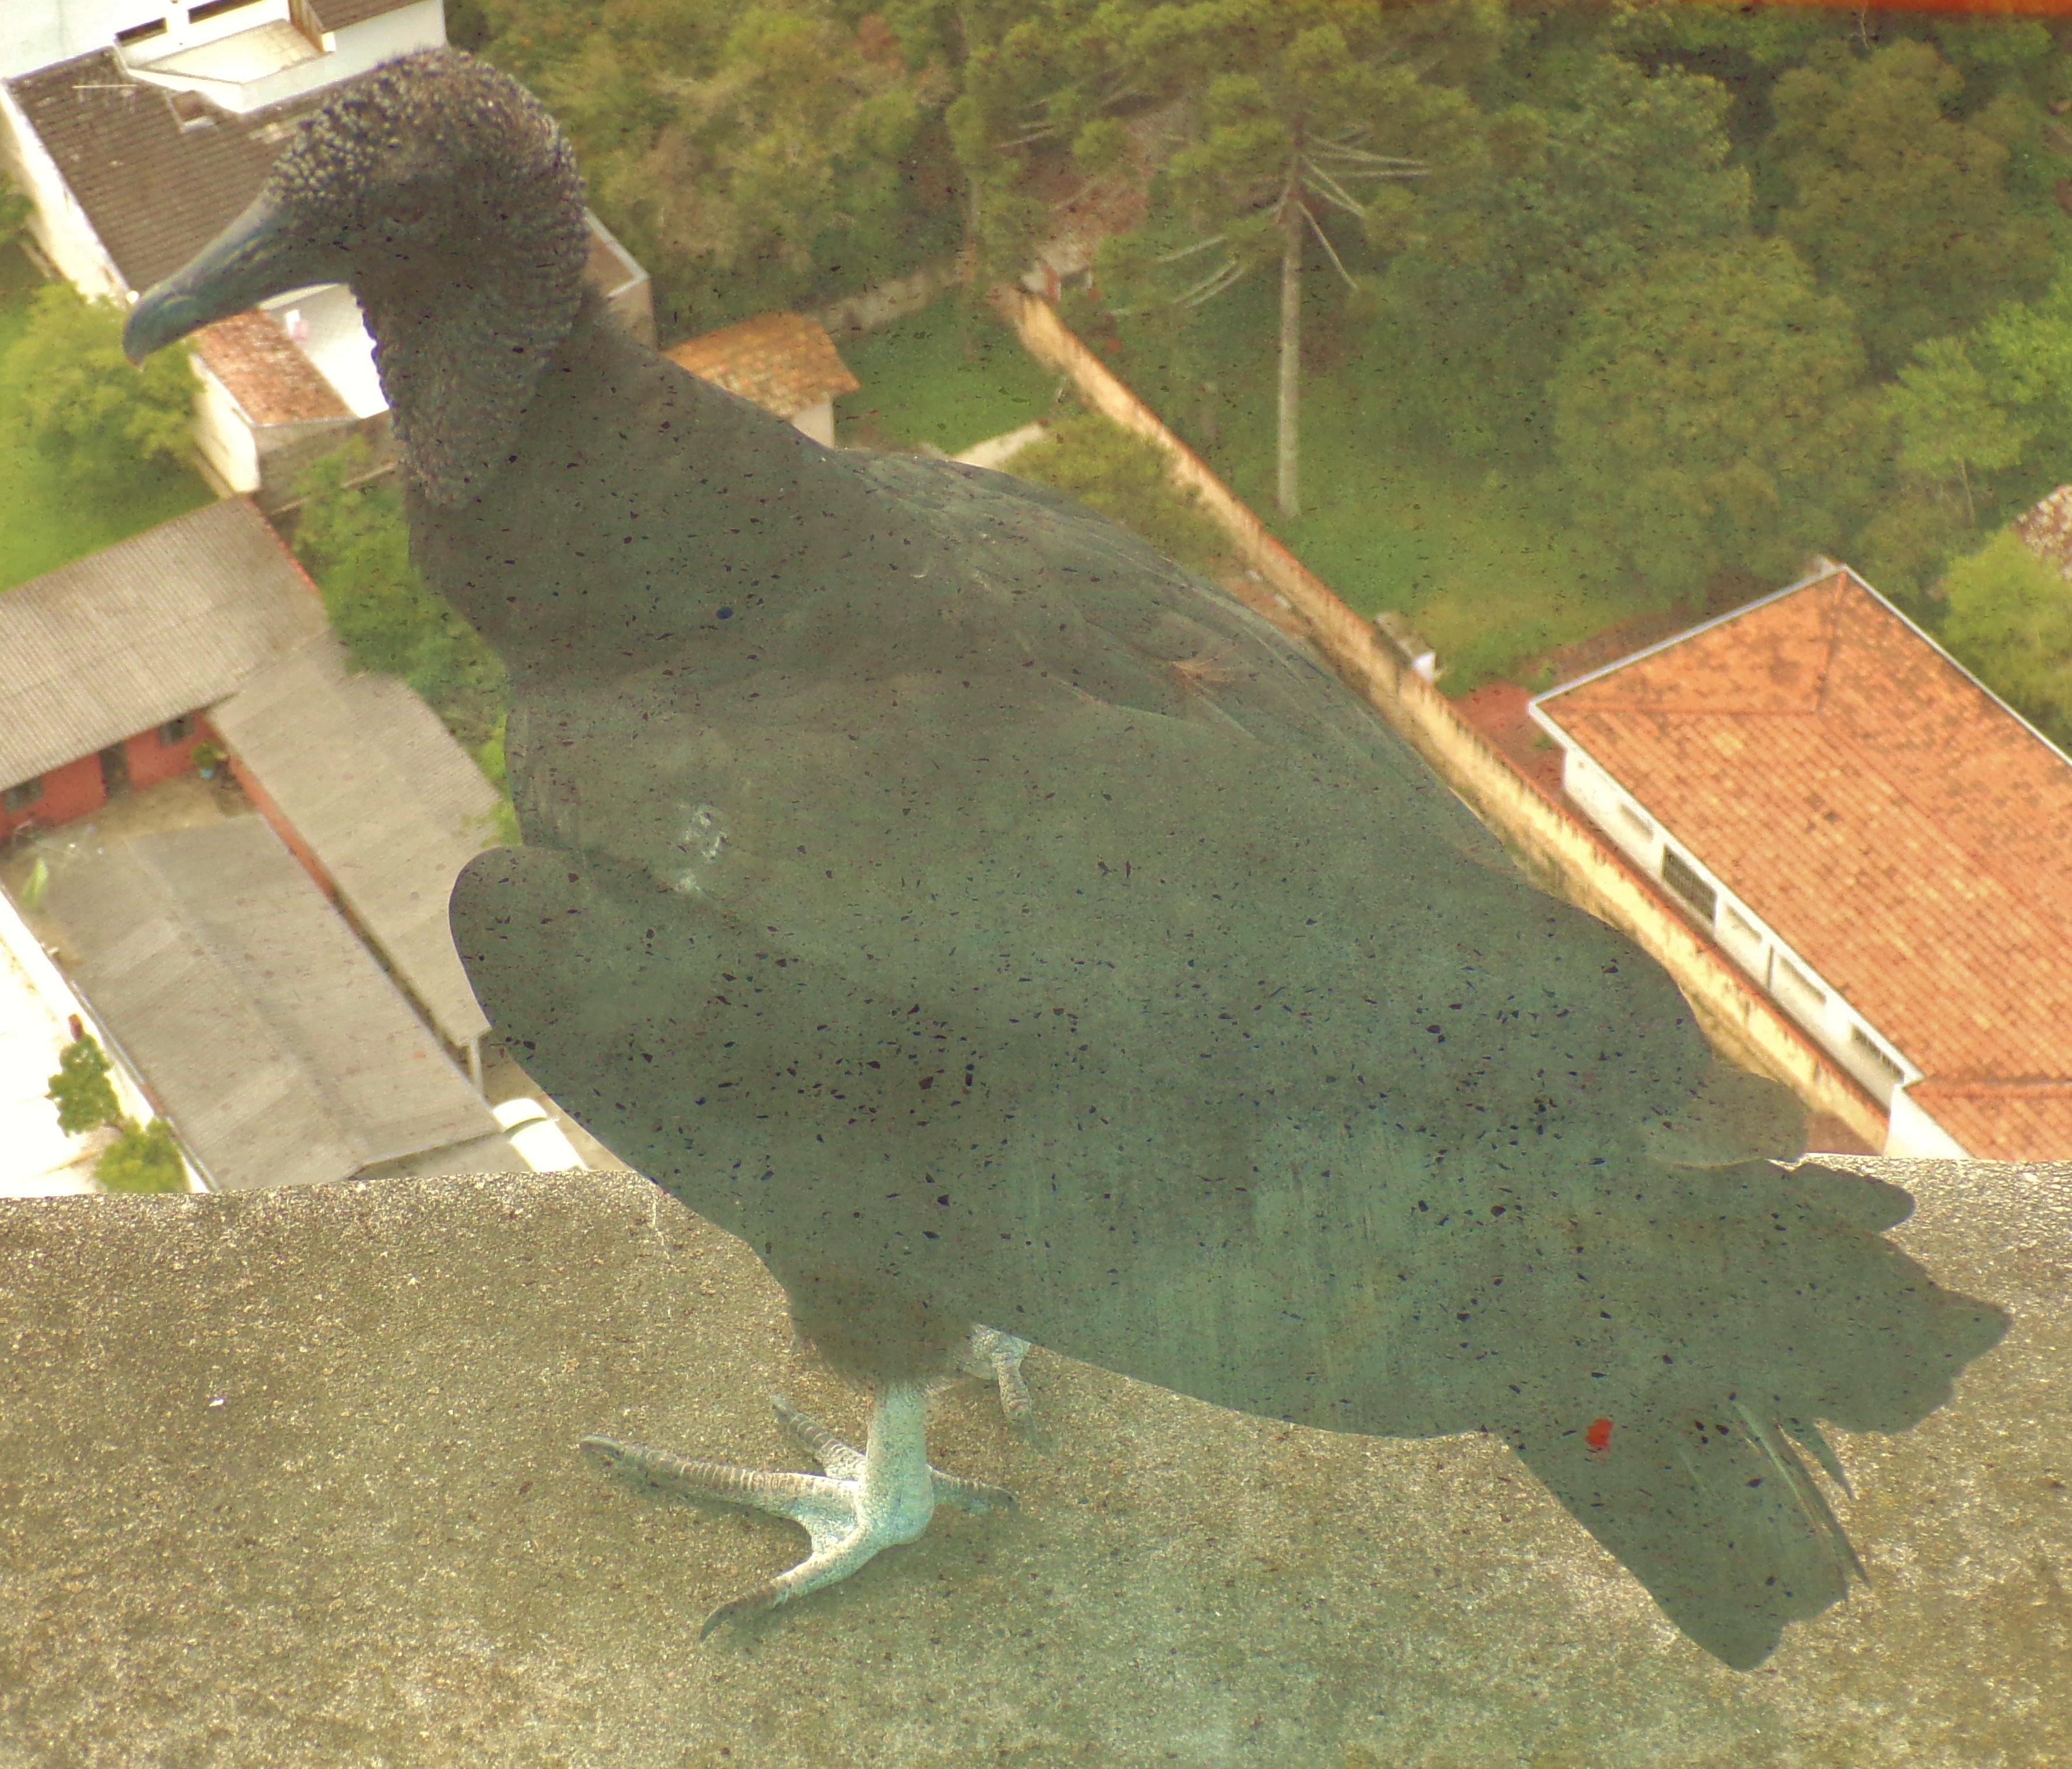 Vulture on the ledge